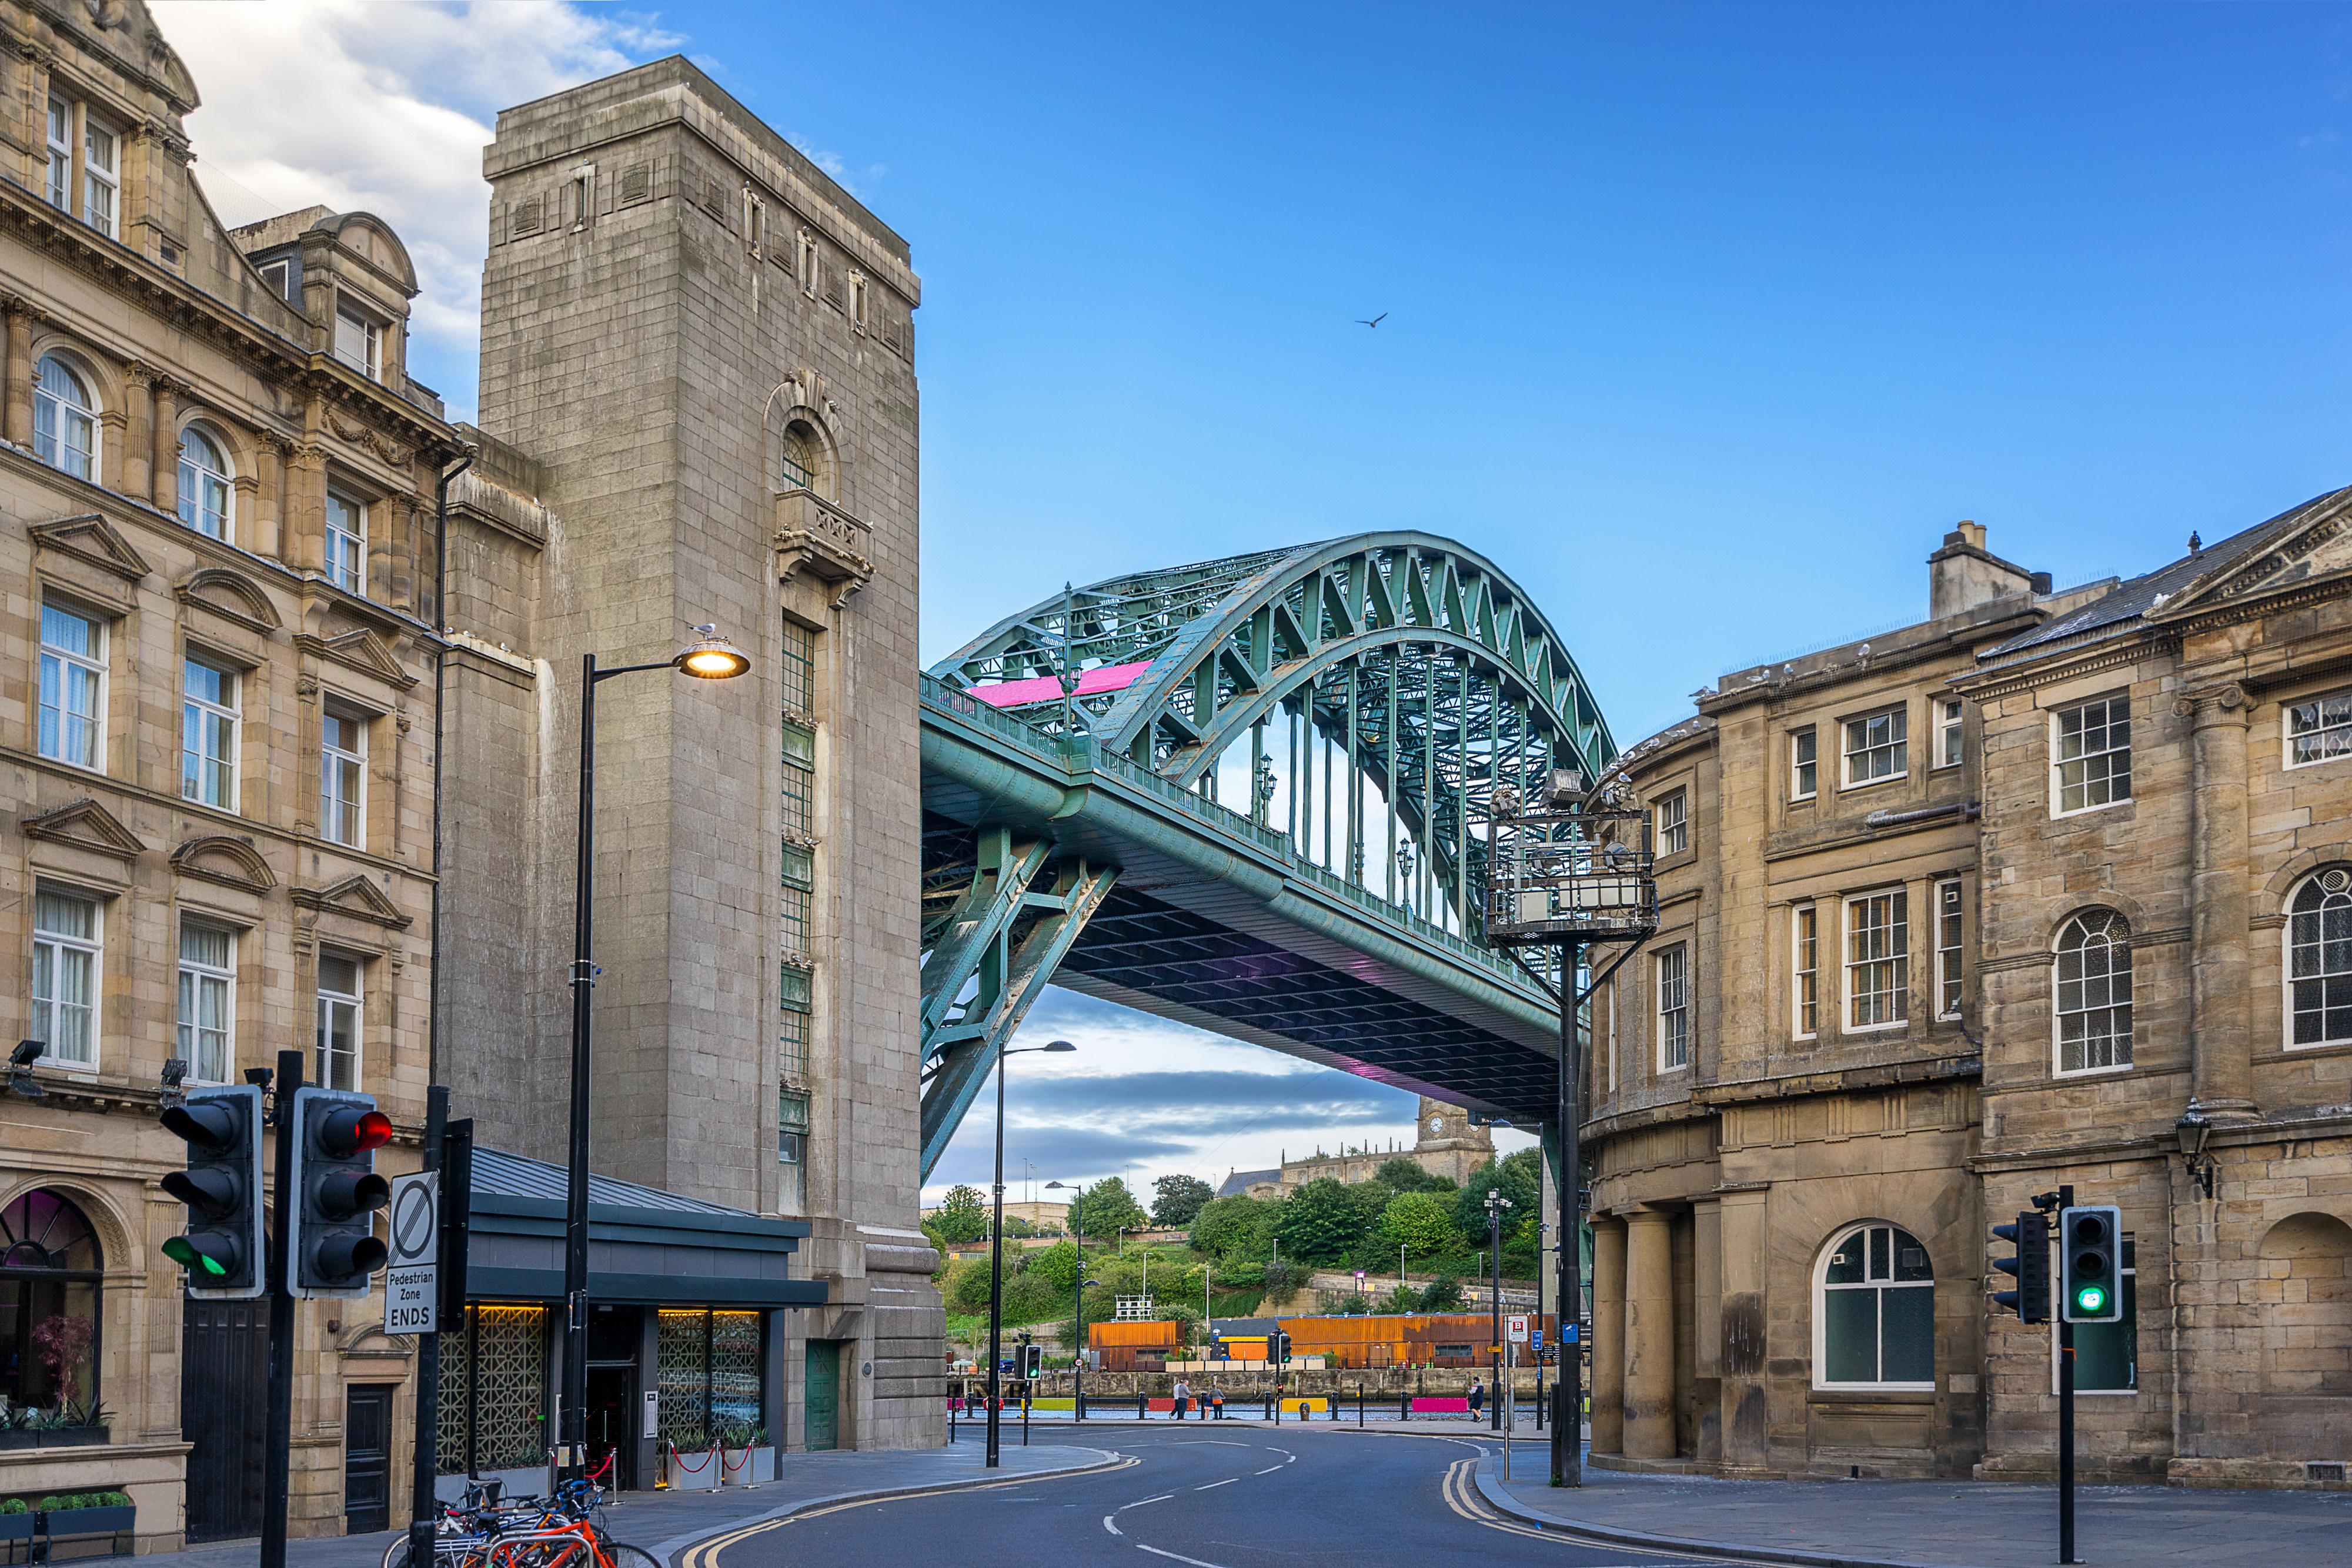 The Tyne Bridge across the river Tyne in Newcastle